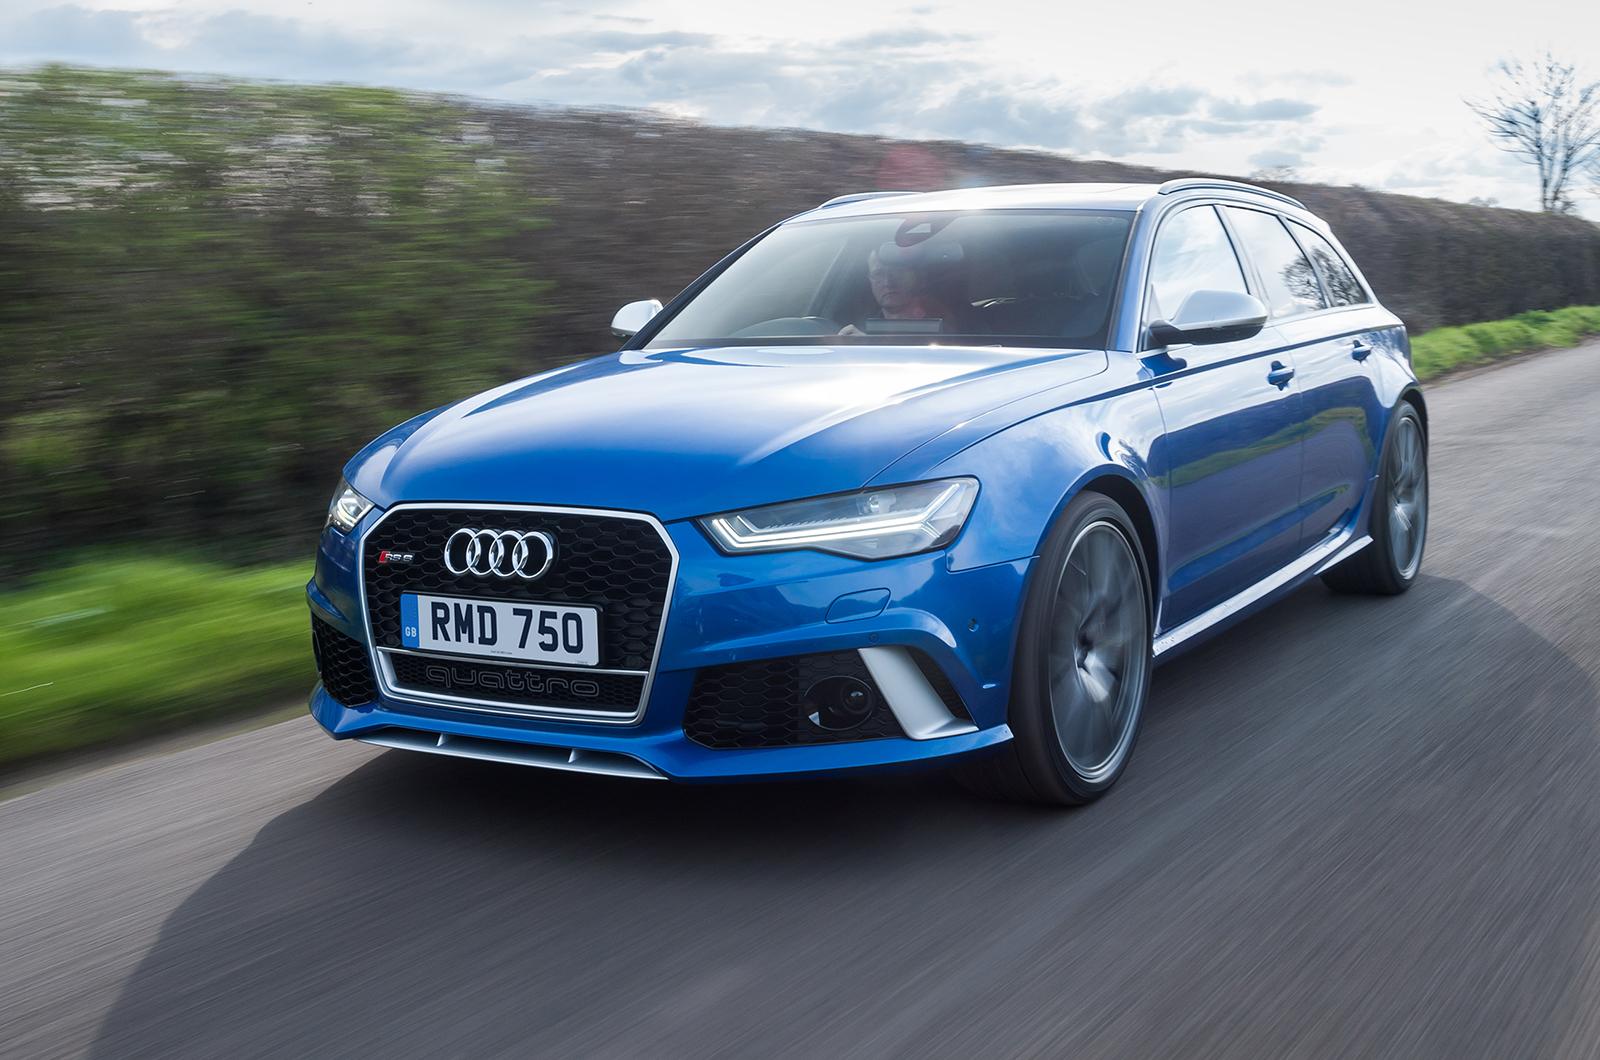 Kelebihan Audi Rs6 2016 Top Model Tahun Ini